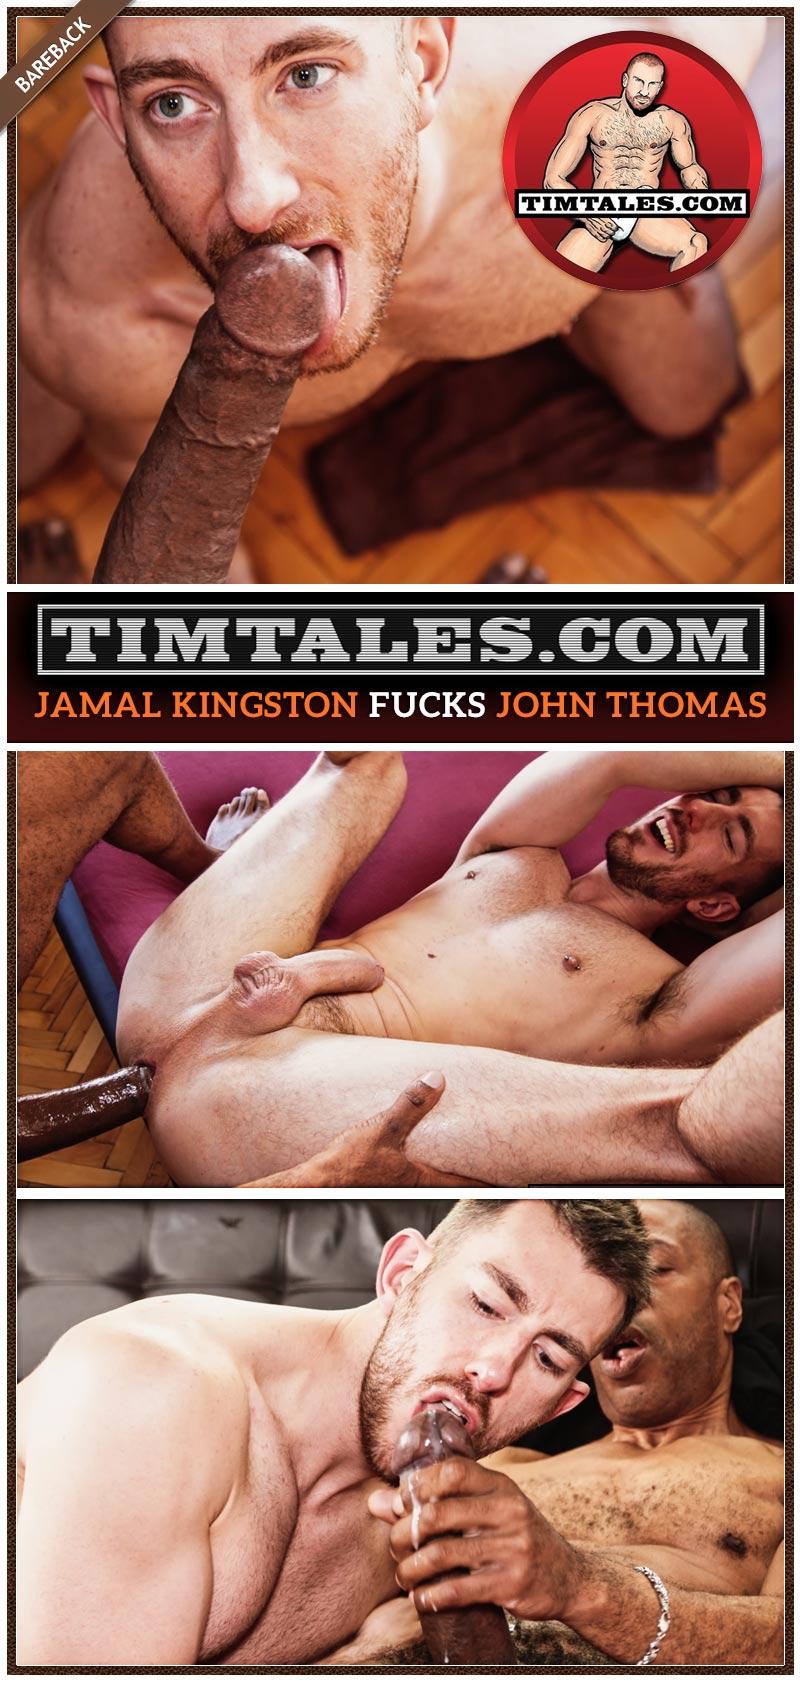 Jamal Kingston Fucks John Thomas at TimTales